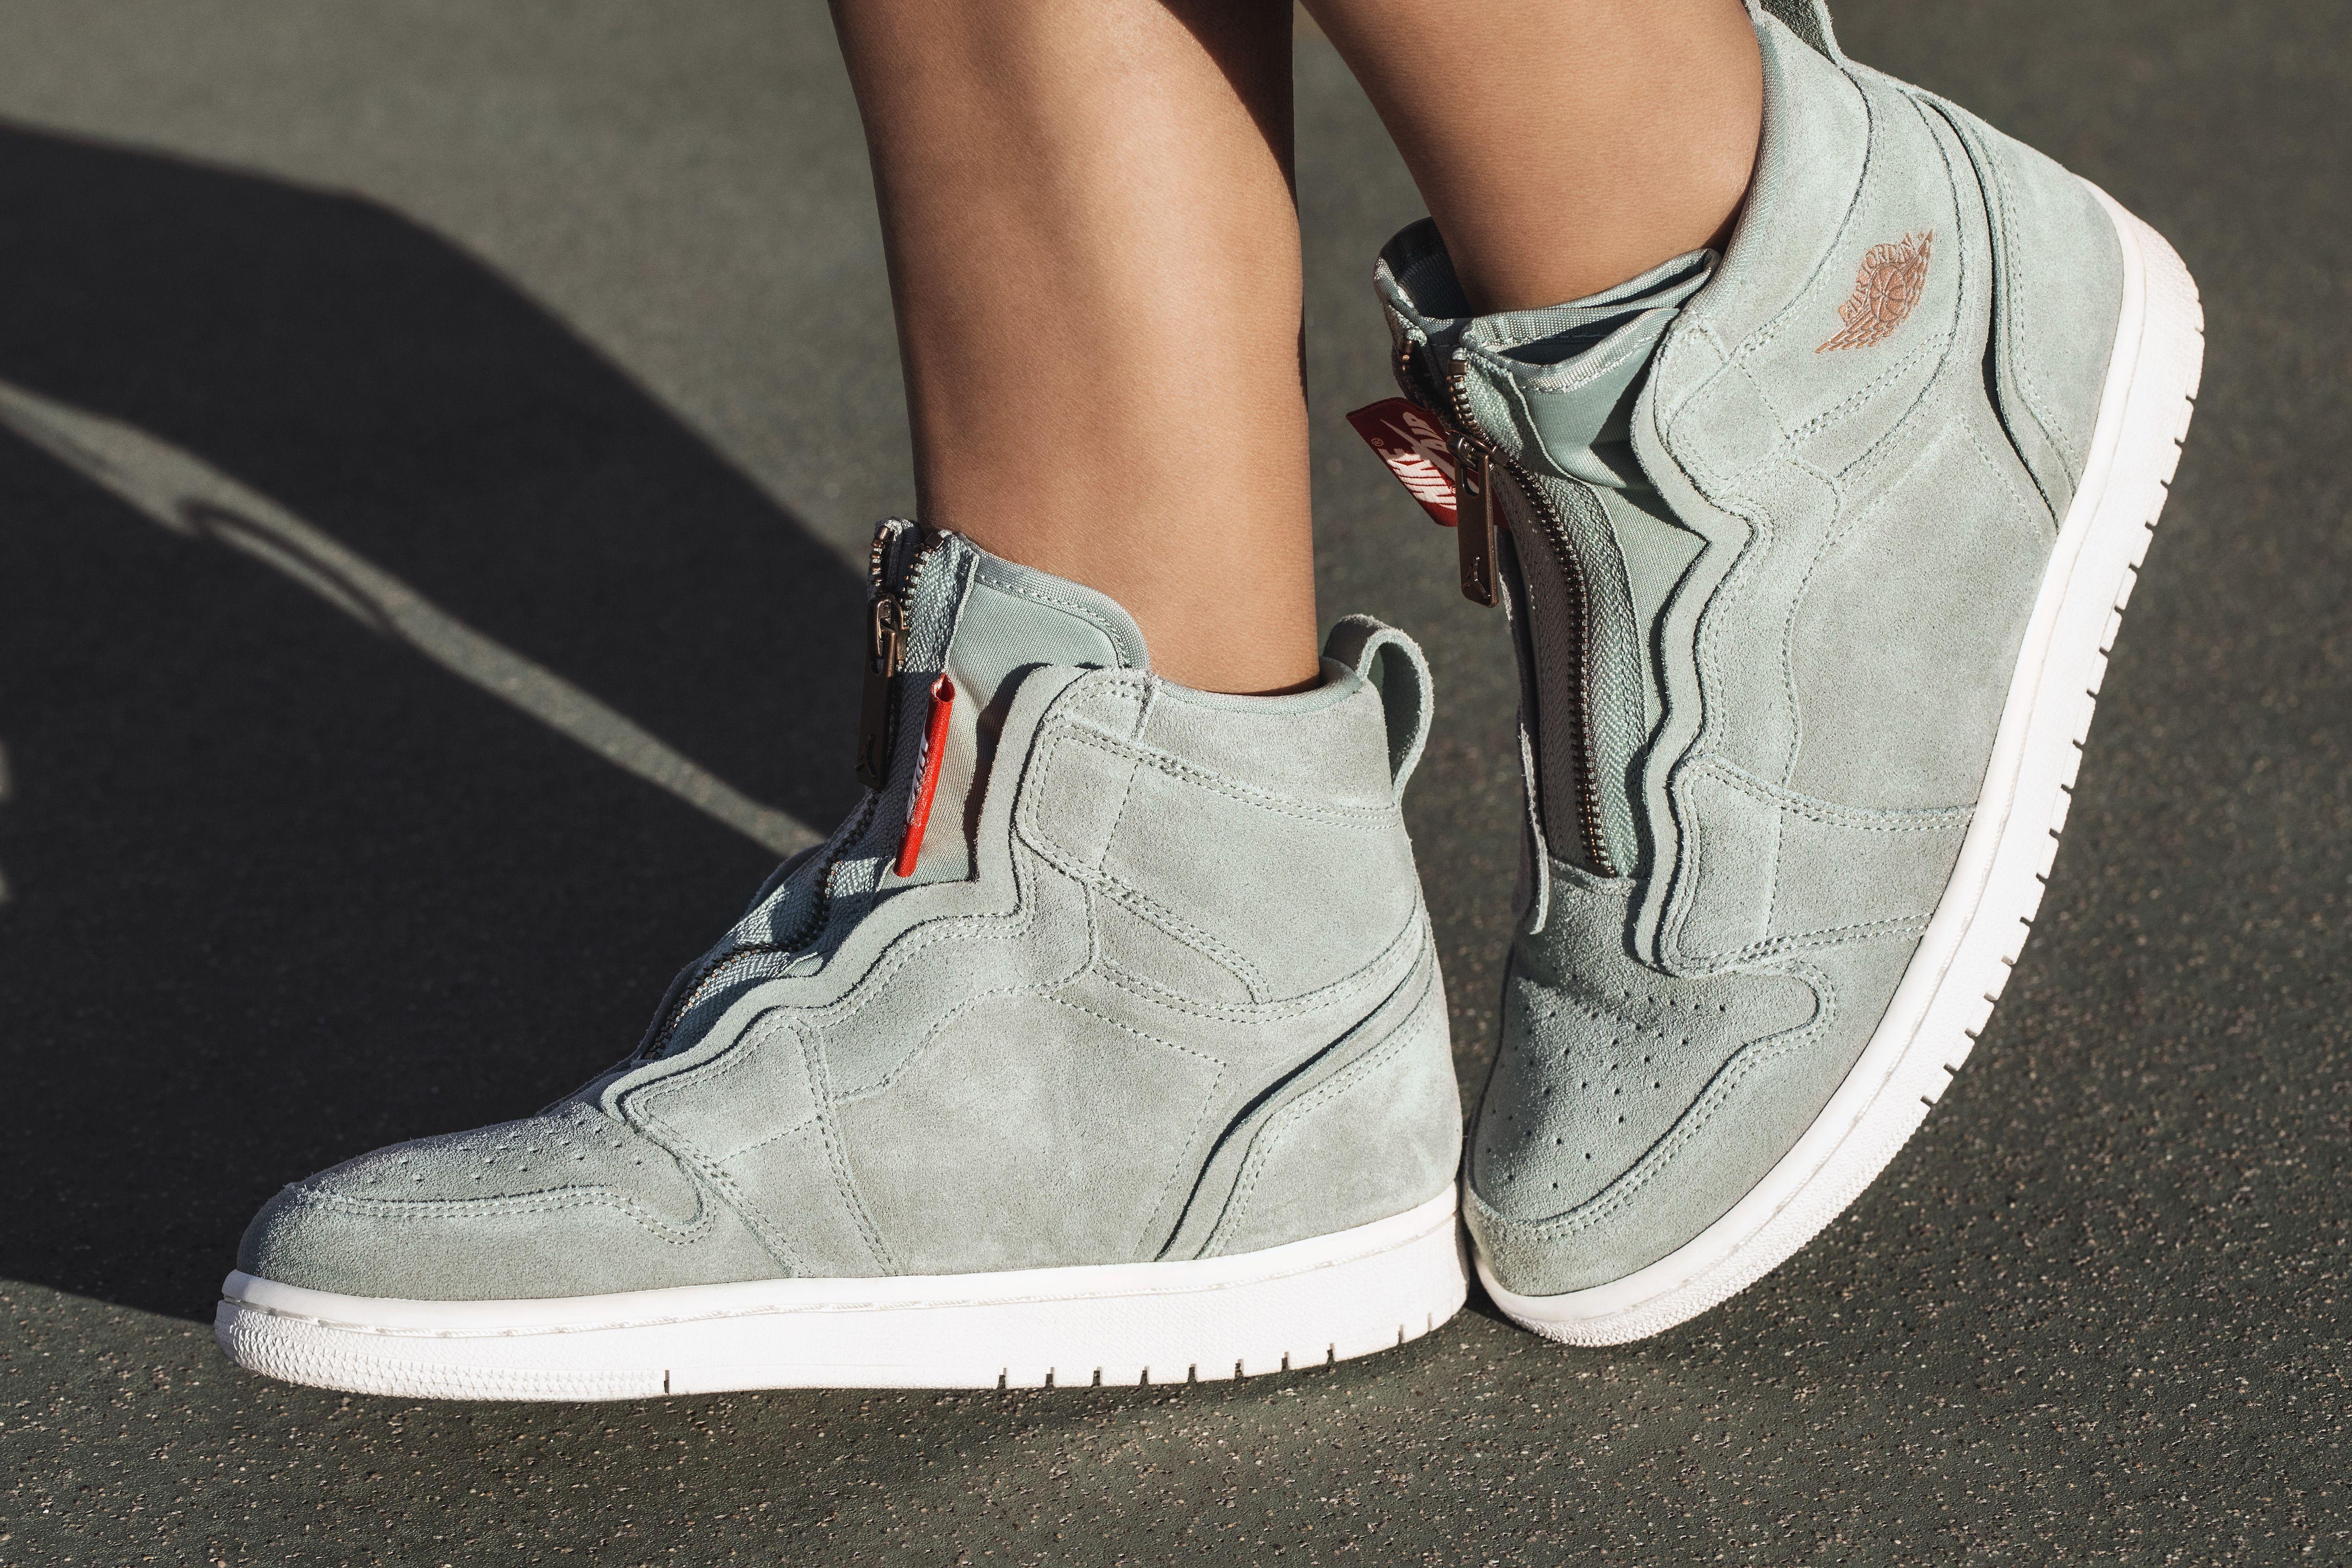 Fascinar Produce accidente  Pin by Jill Hatcher on Style | Hype shoes, Air jordans, Womens jordans